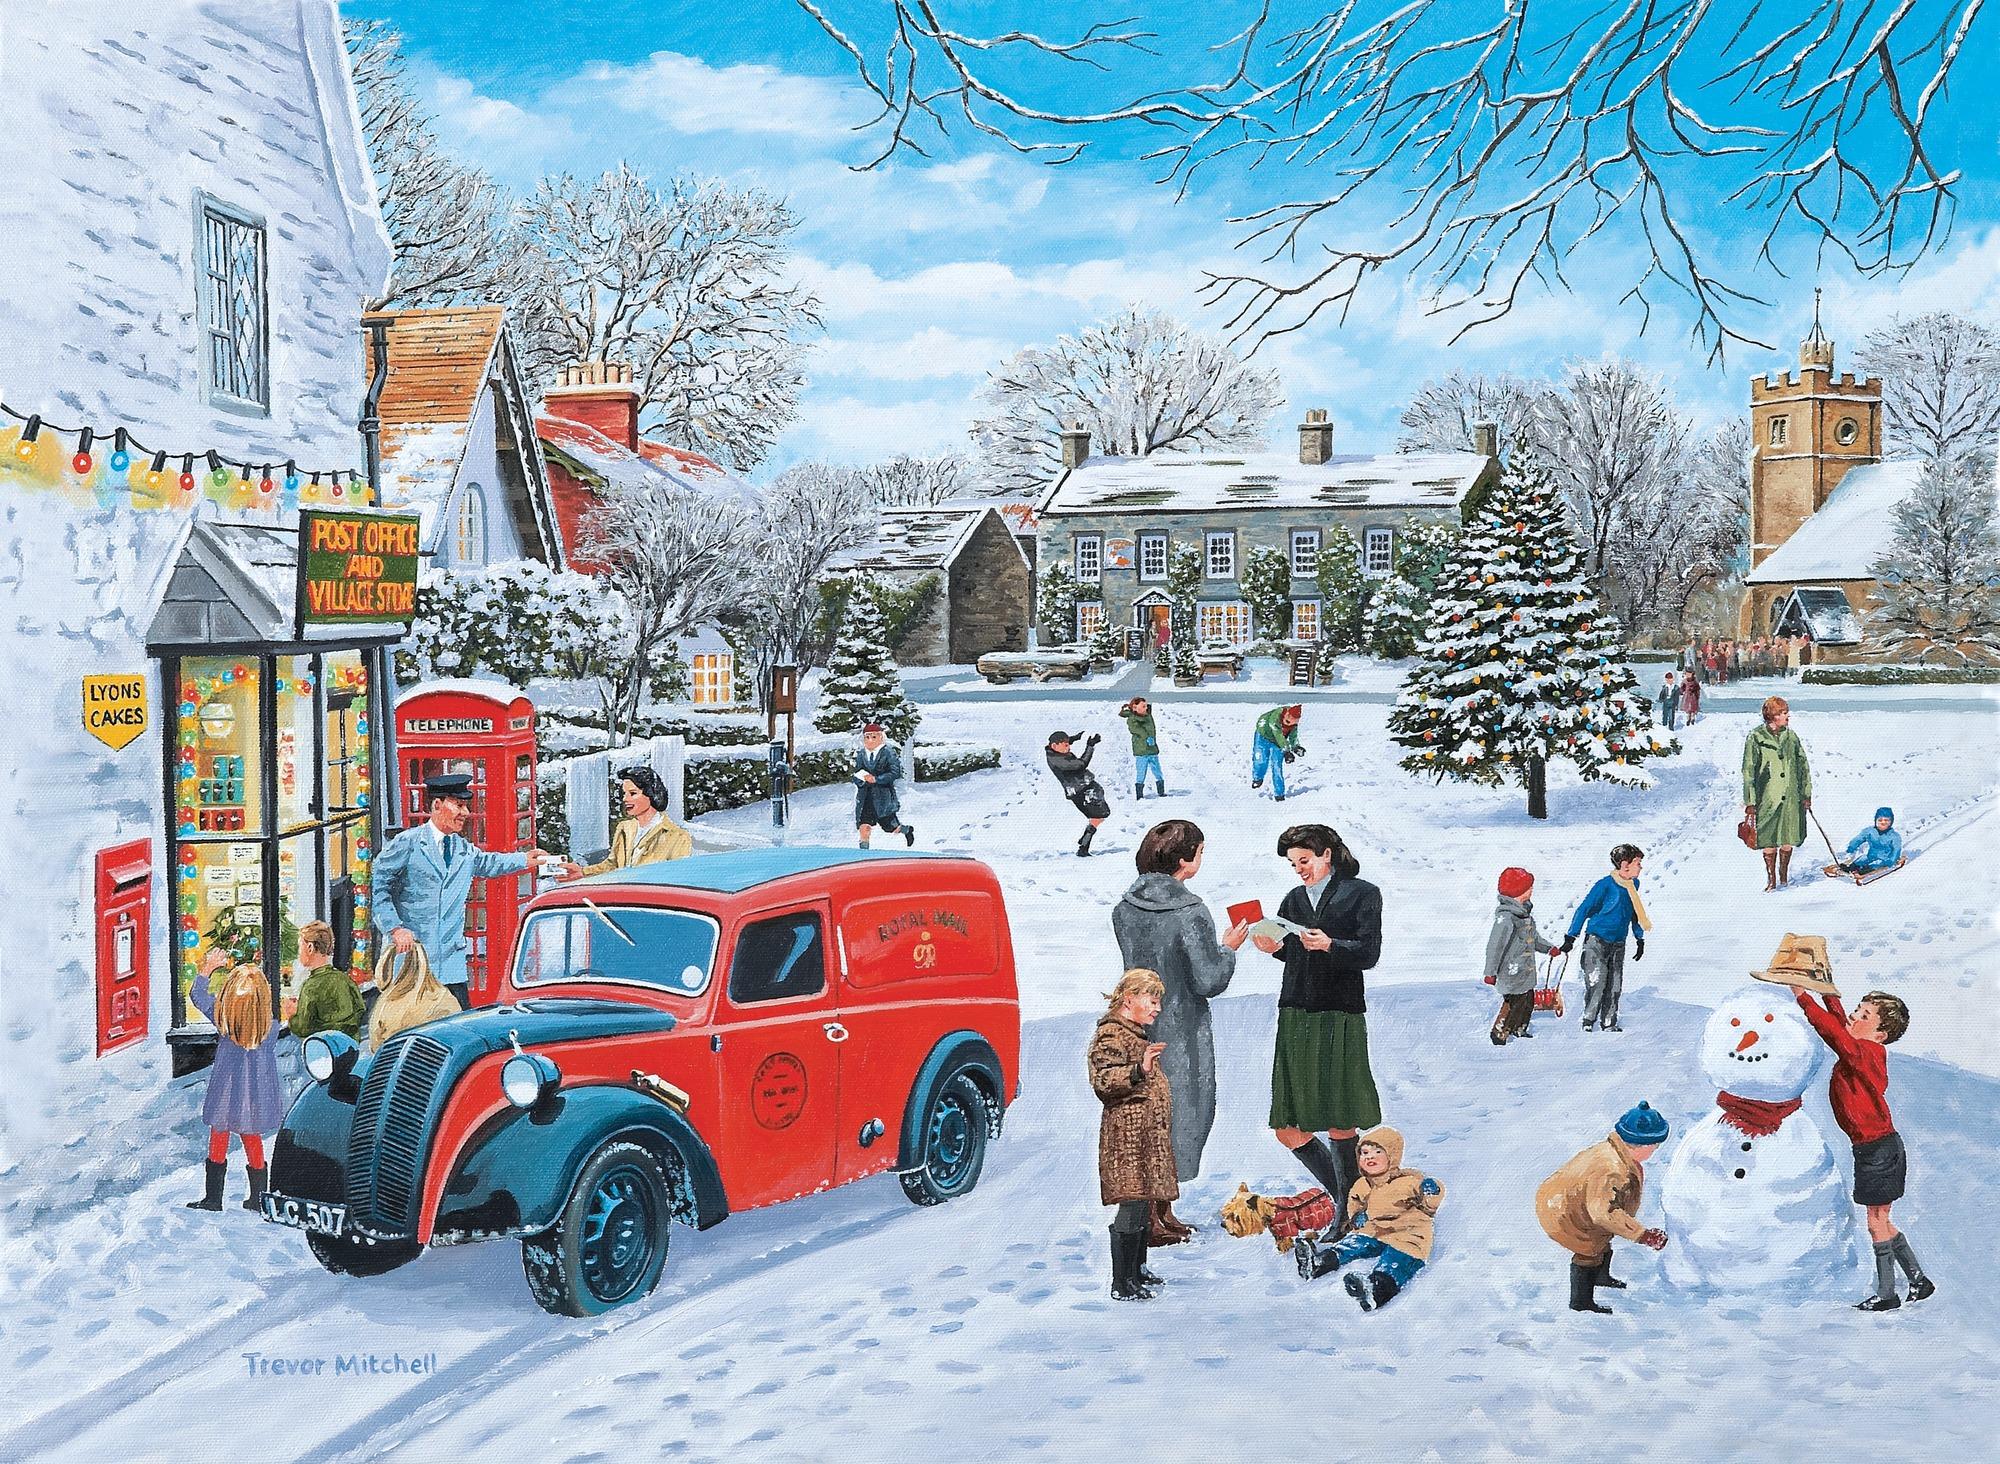 Christmas Wall Mural Christmas Wallpaper Wallsauce UK